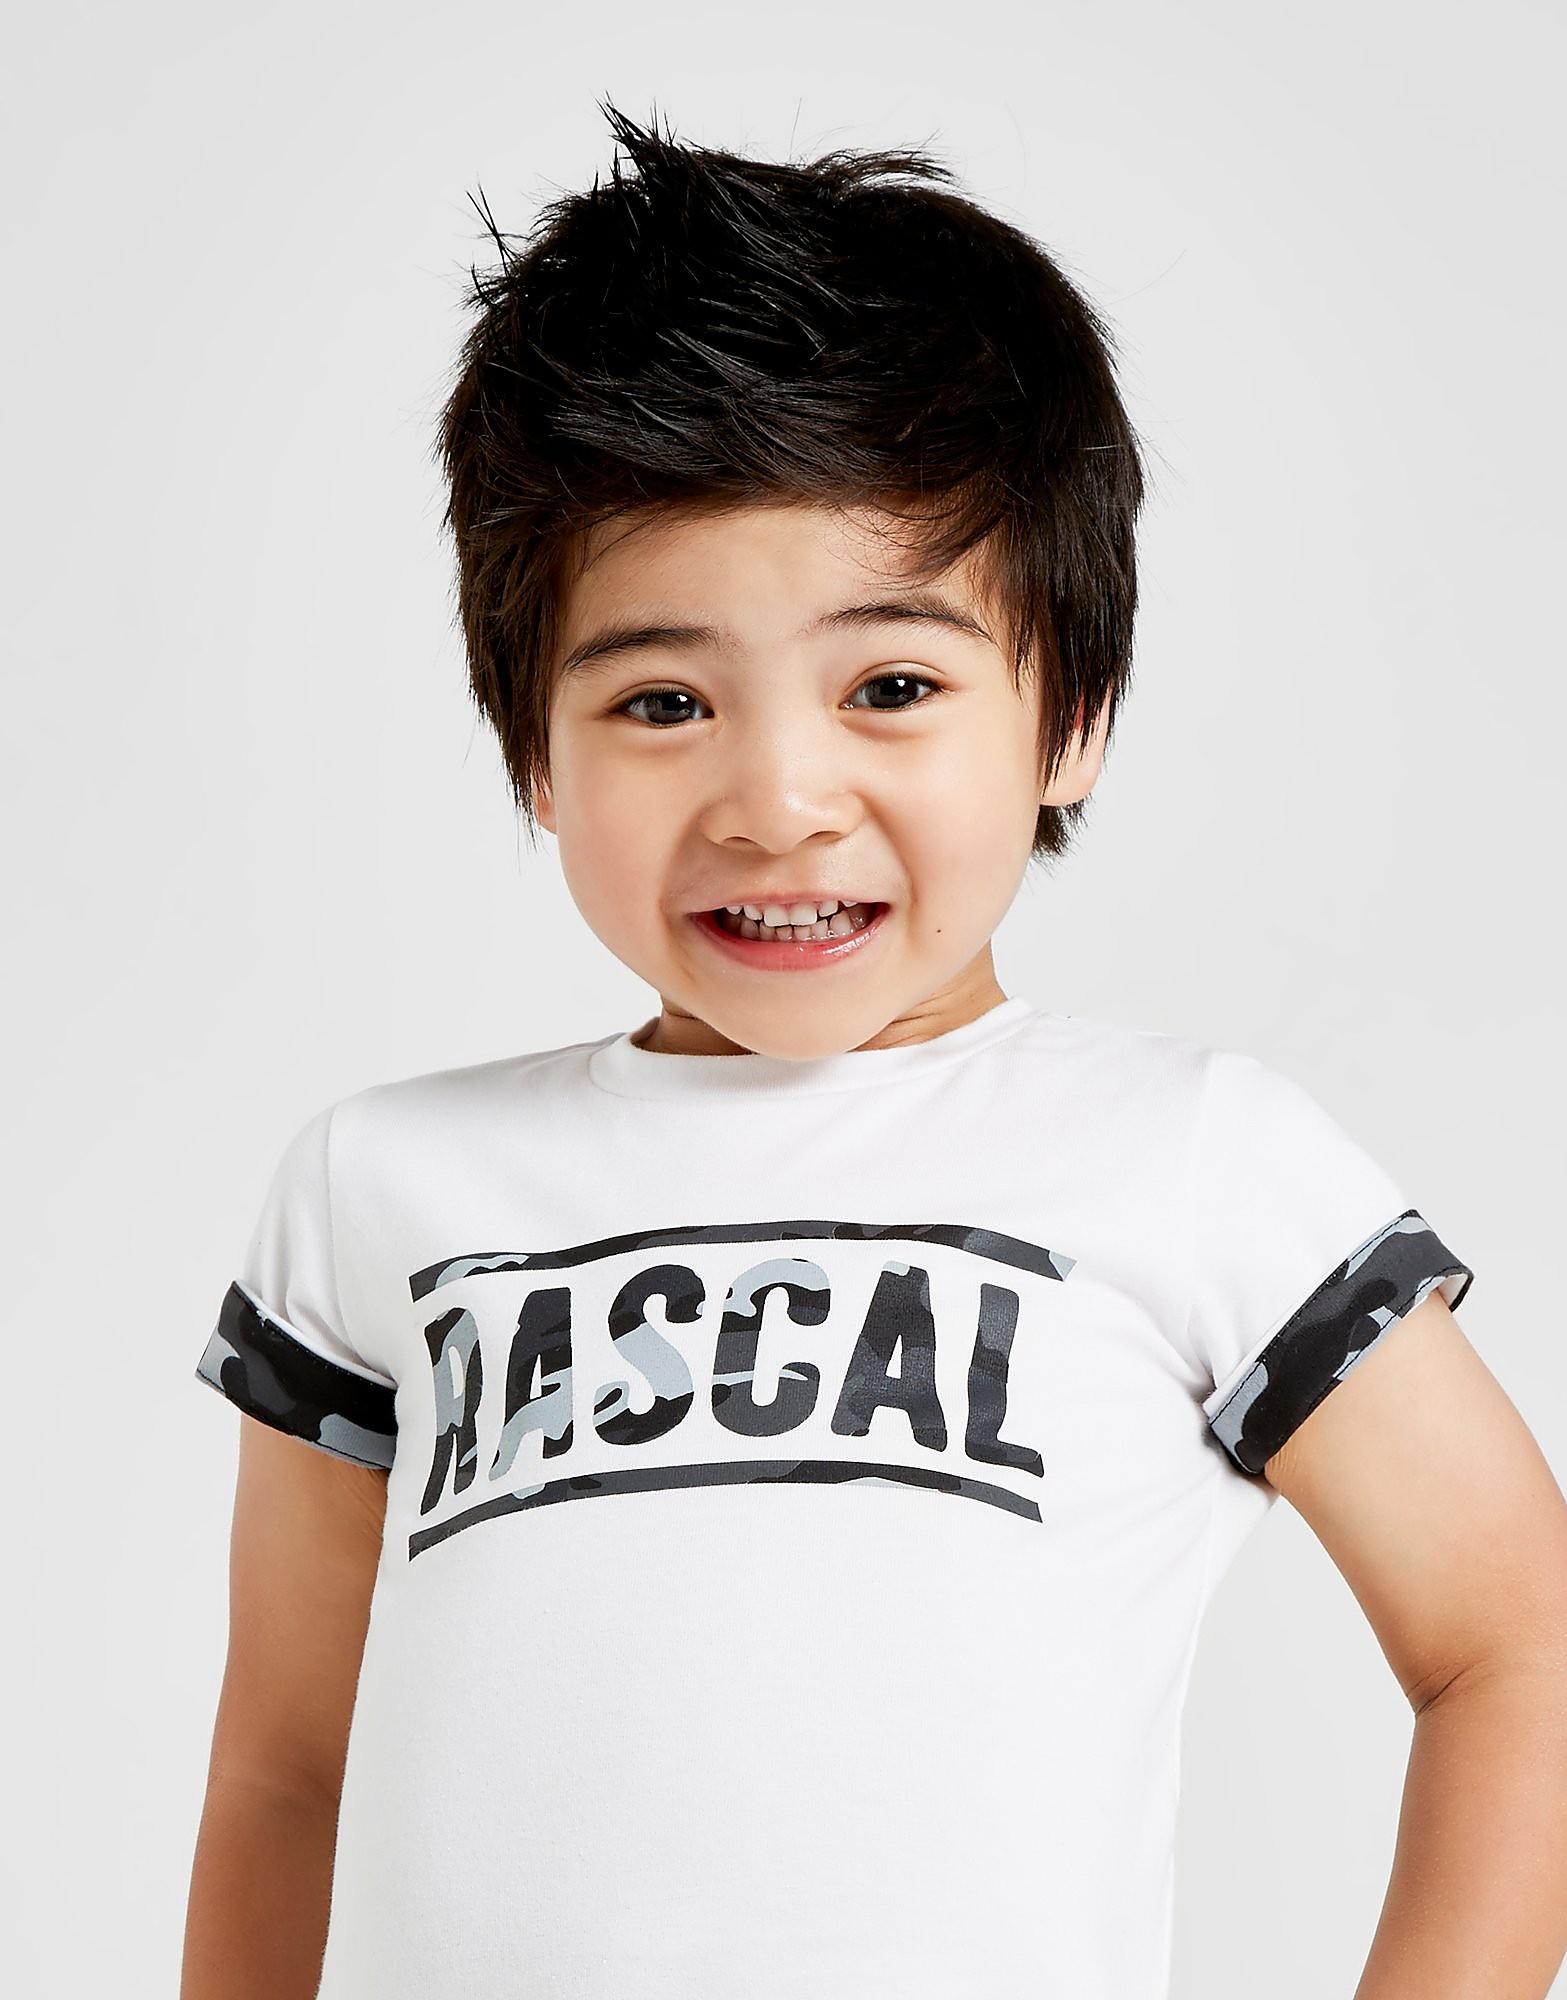 Rascal Camo Infill T-Shirt Baby's - Wit - Kind